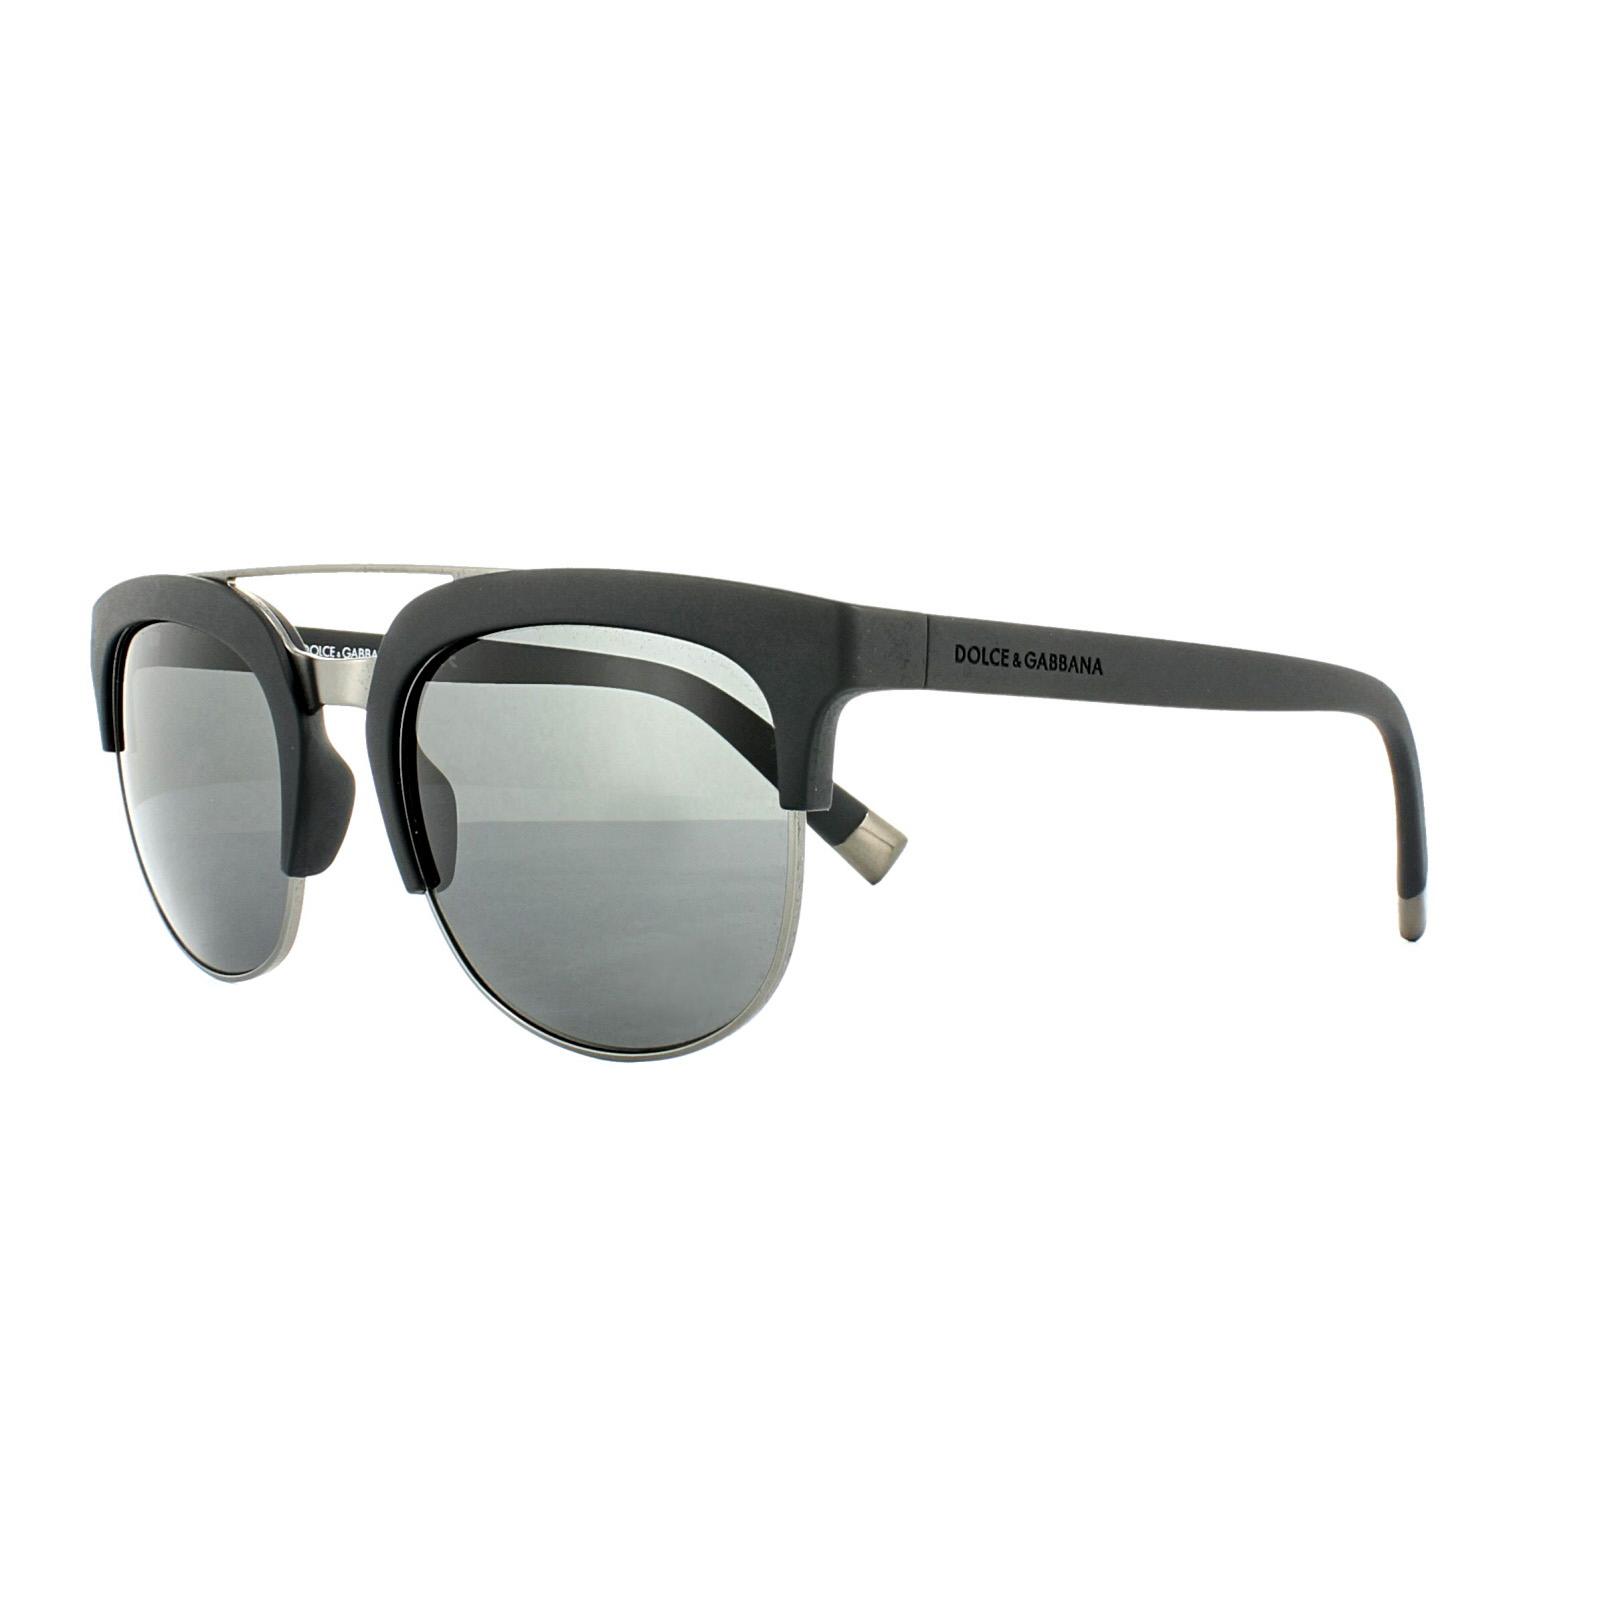 64536bc4530 Cheap Dolce   Gabbana 6103 Sunglasses - Discounted Sunglasses